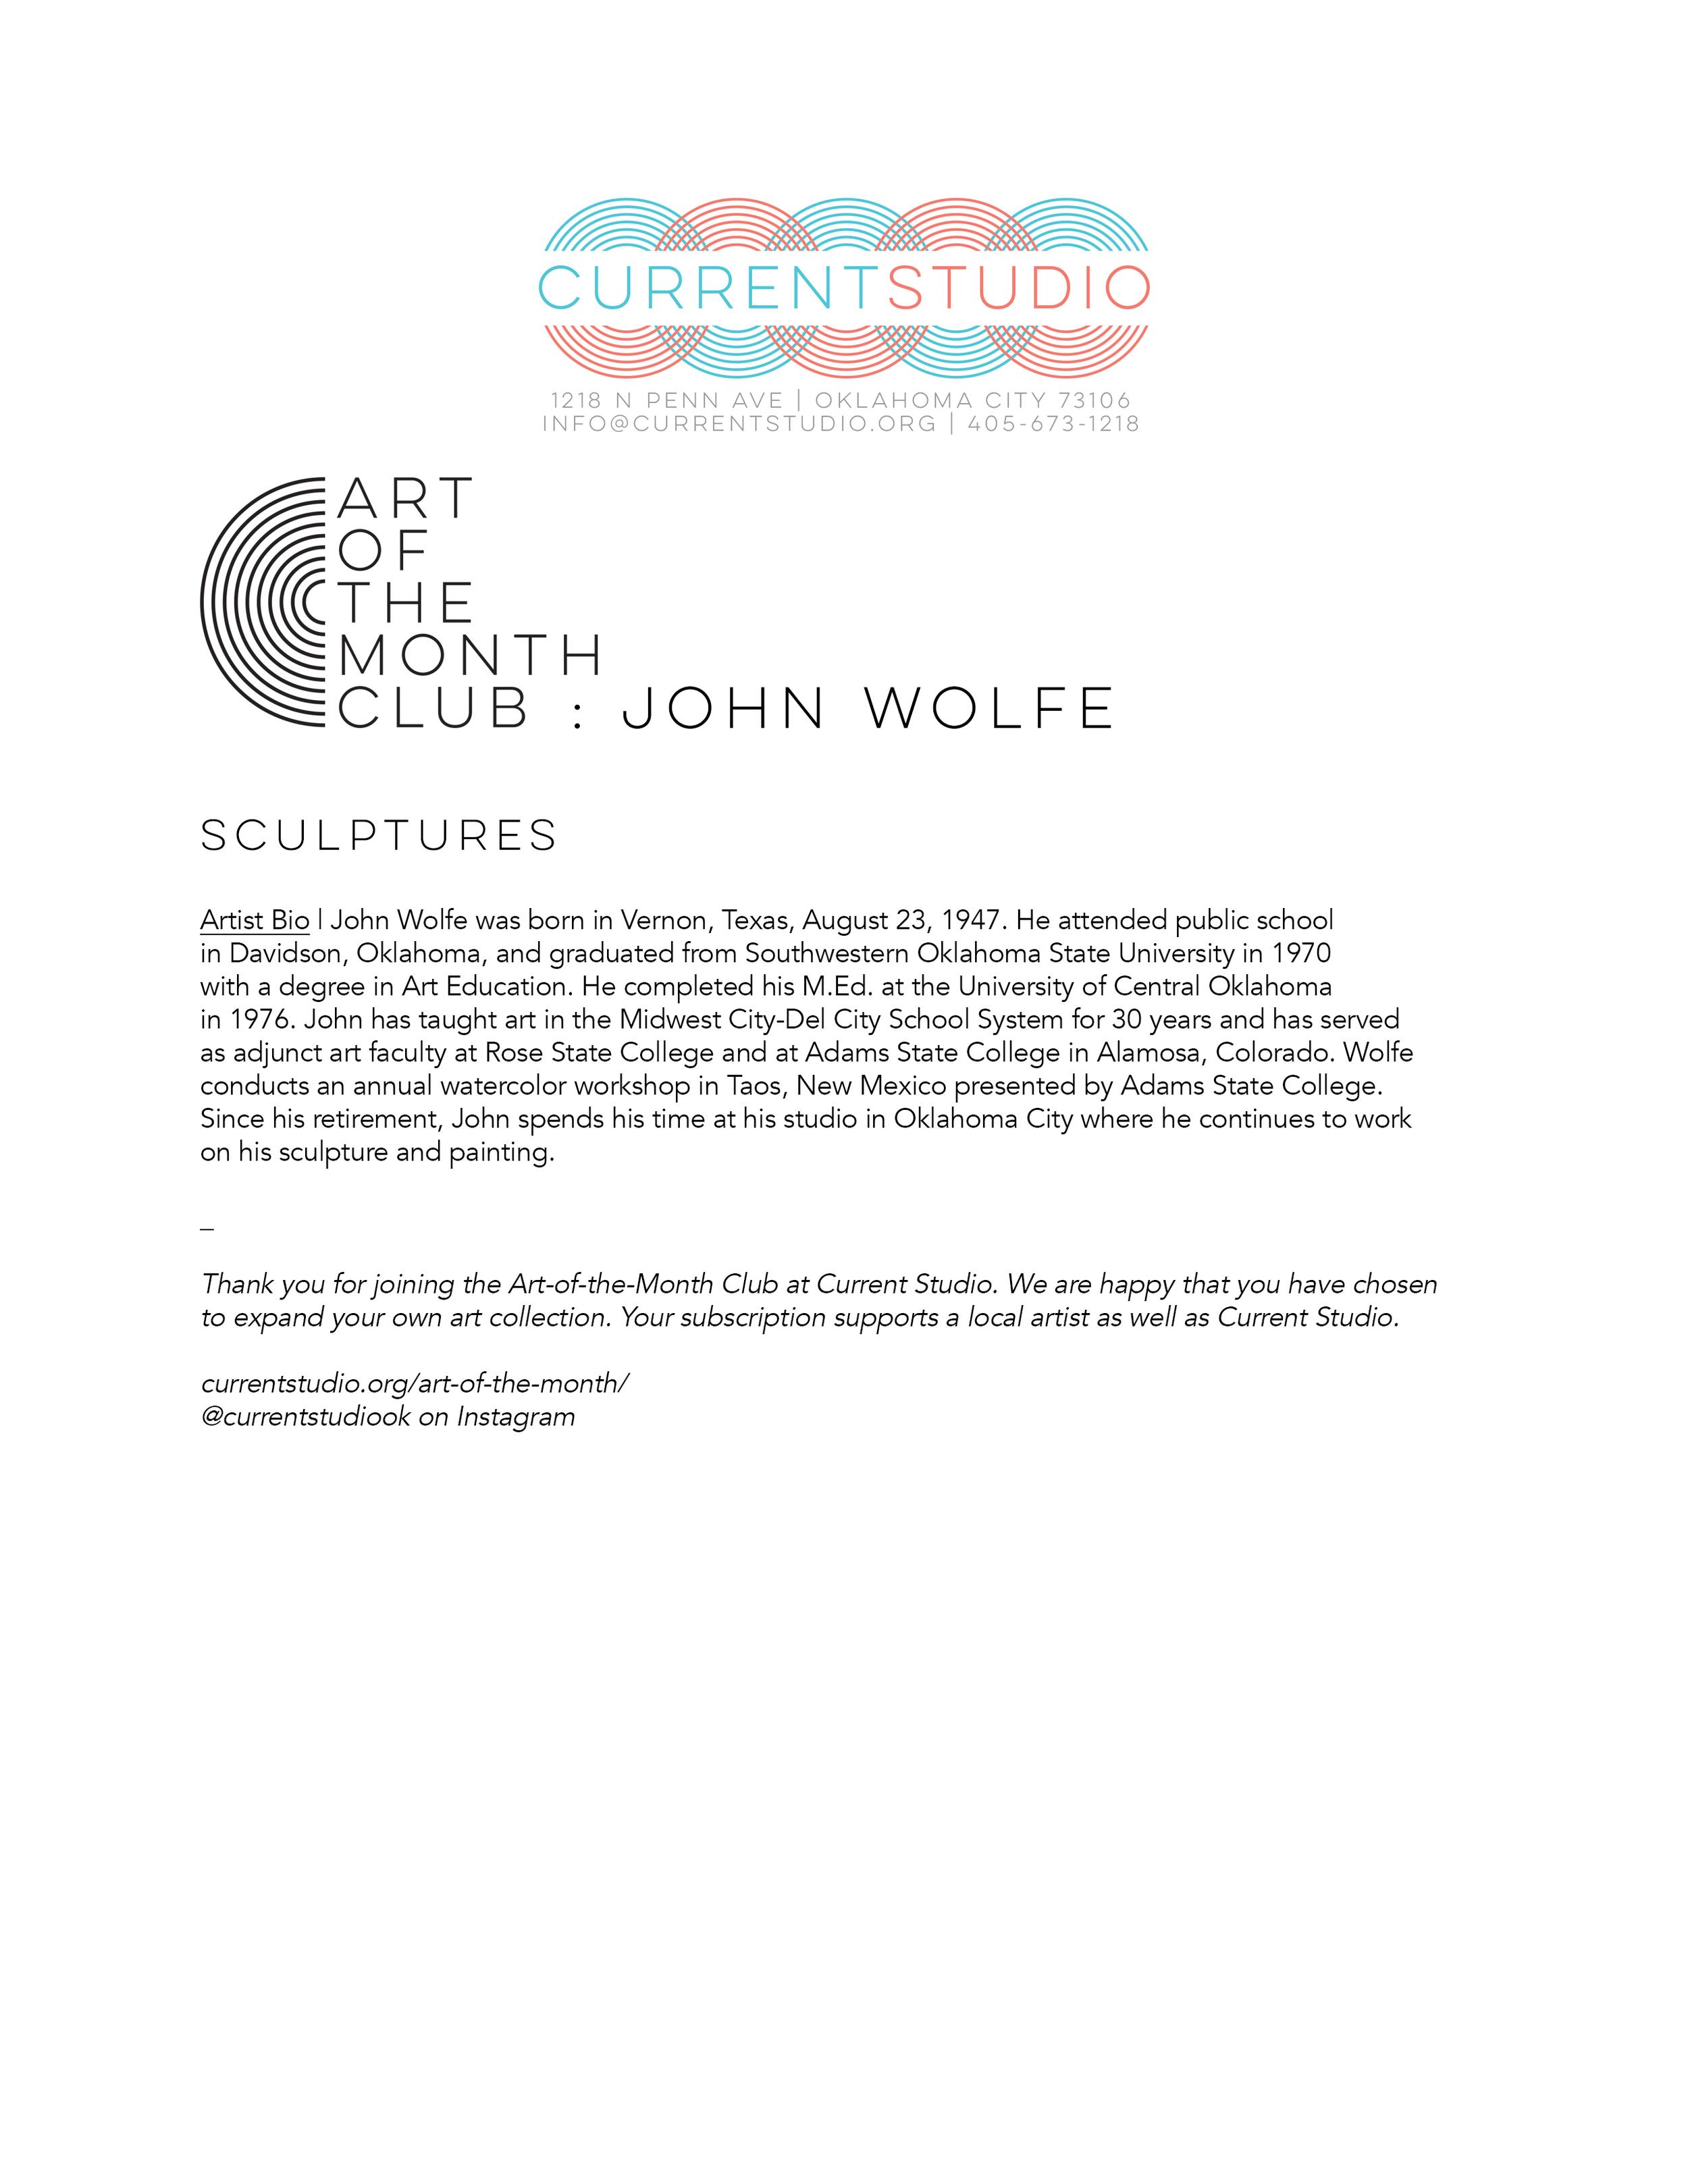 art of the month artist sheet - john wolfe.jpg